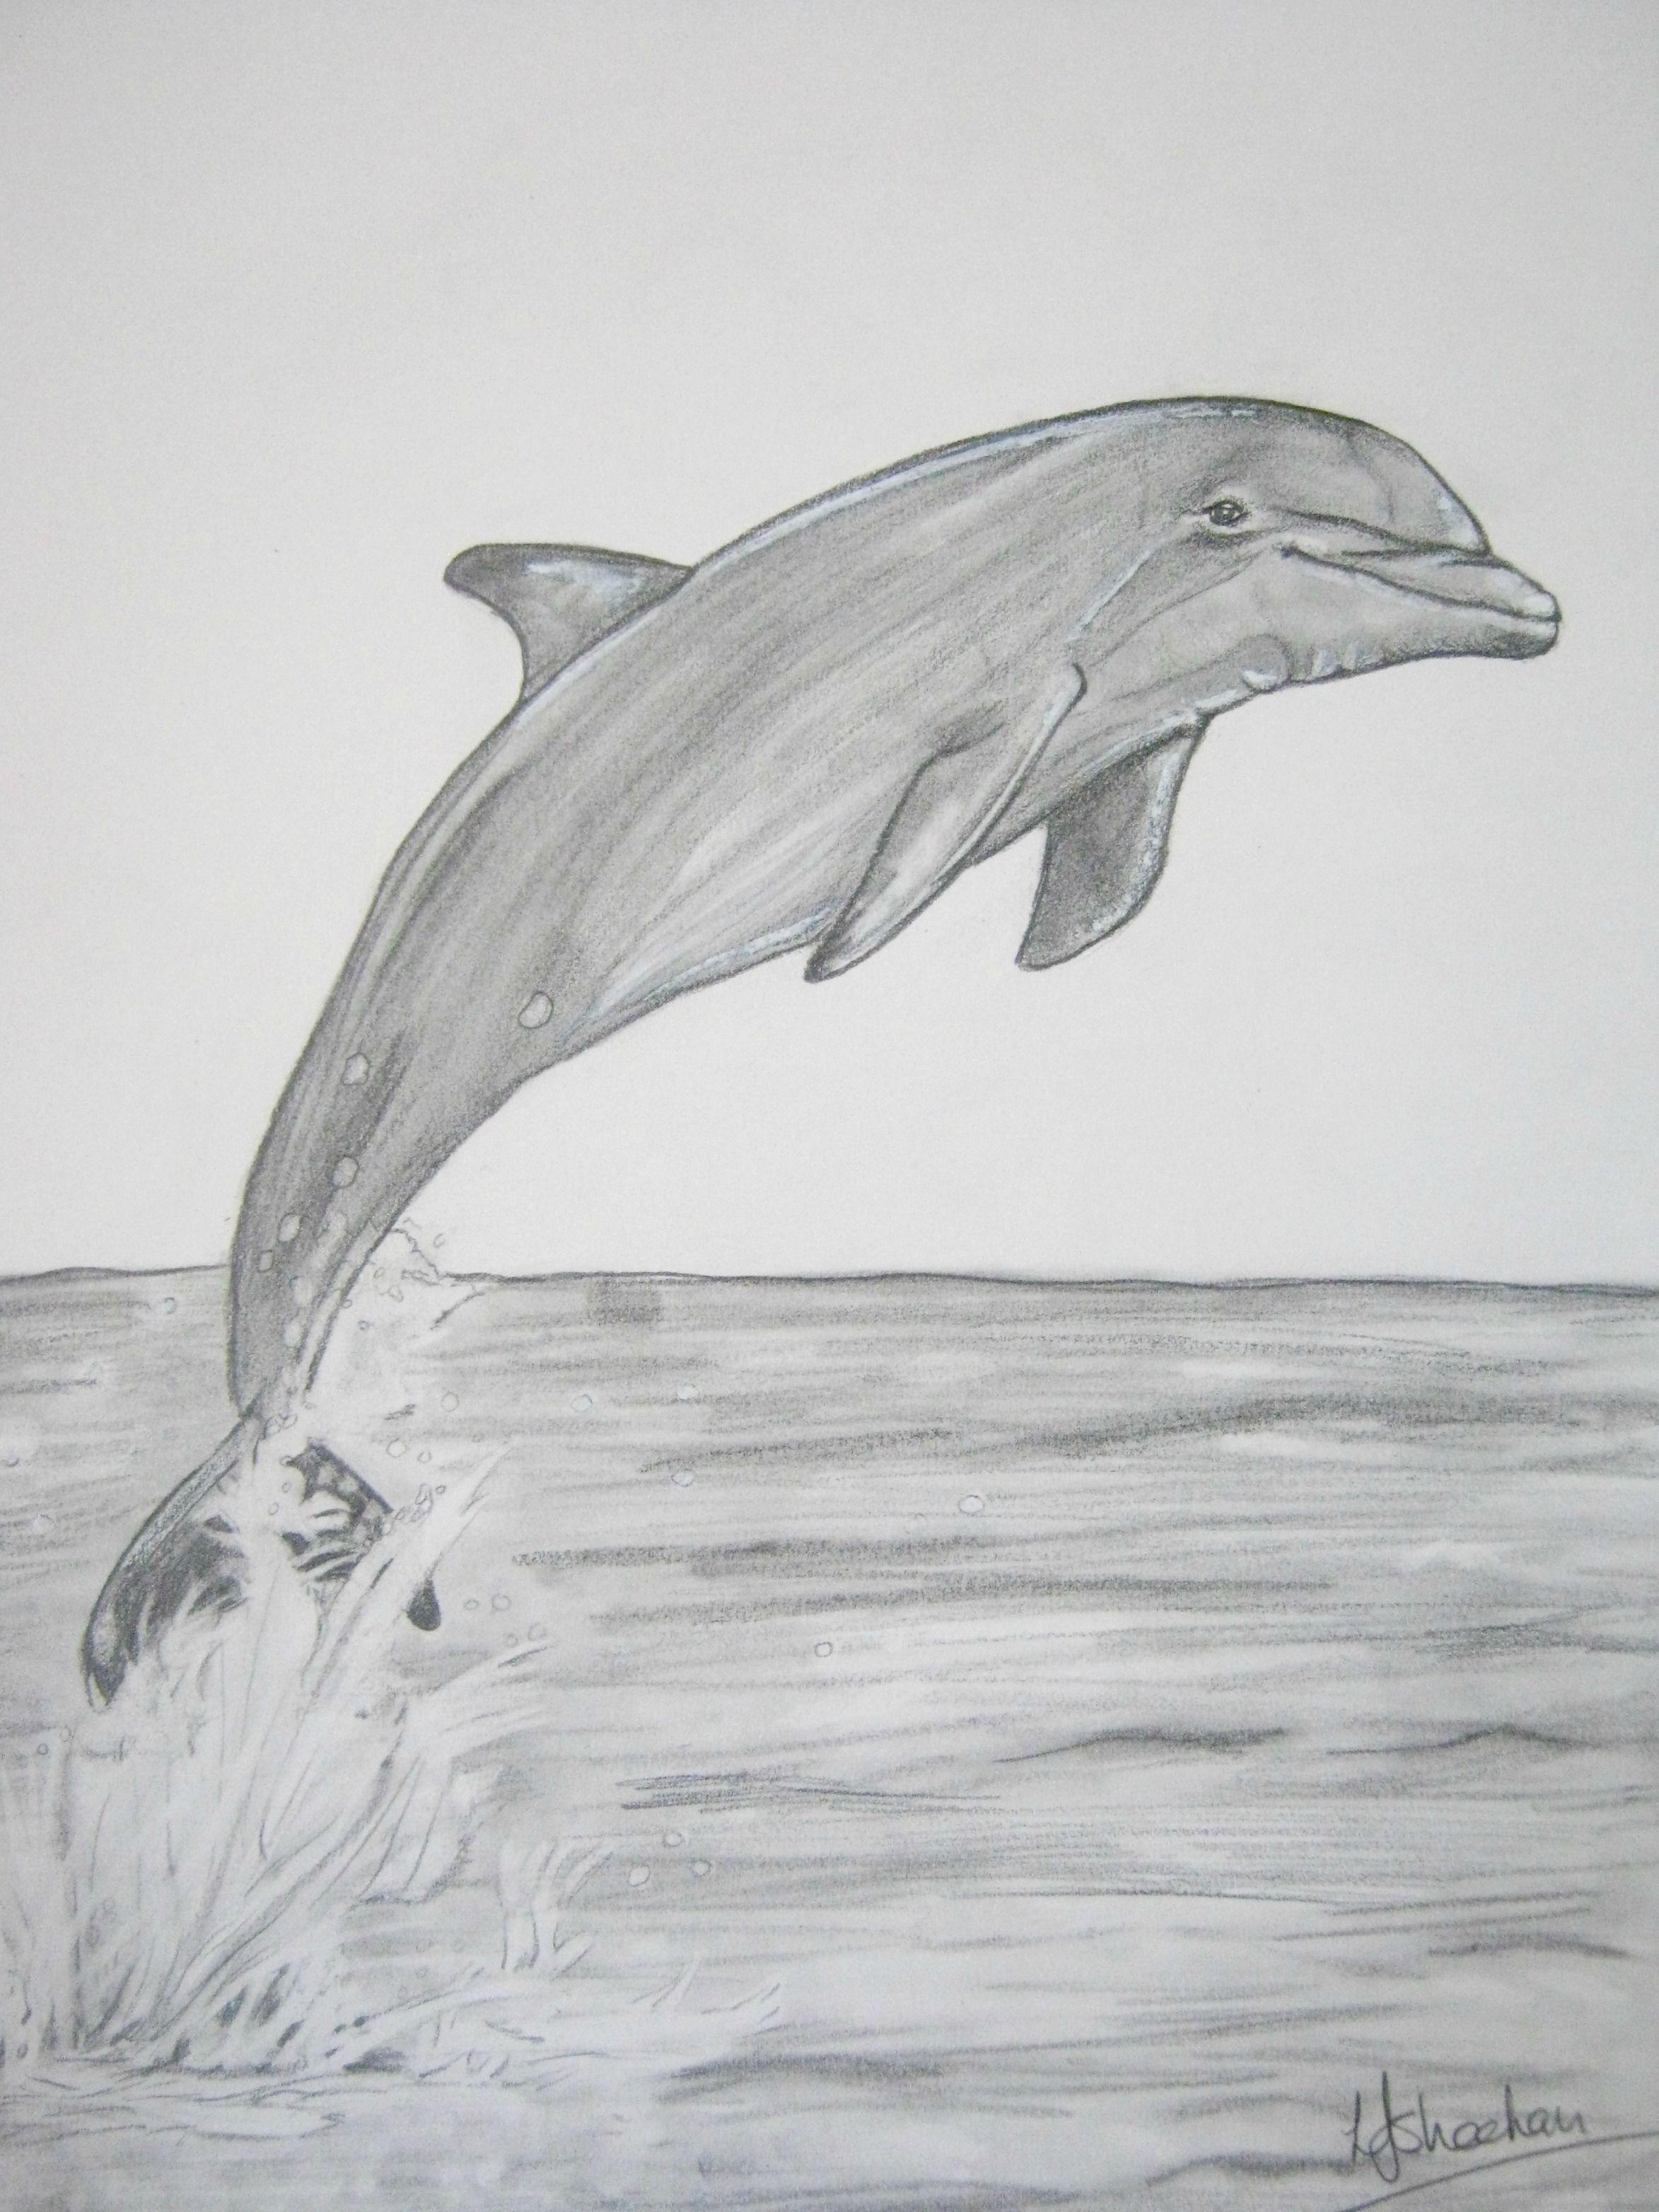 Dolphin A4 graphite, Pencil Sketches Pinterest